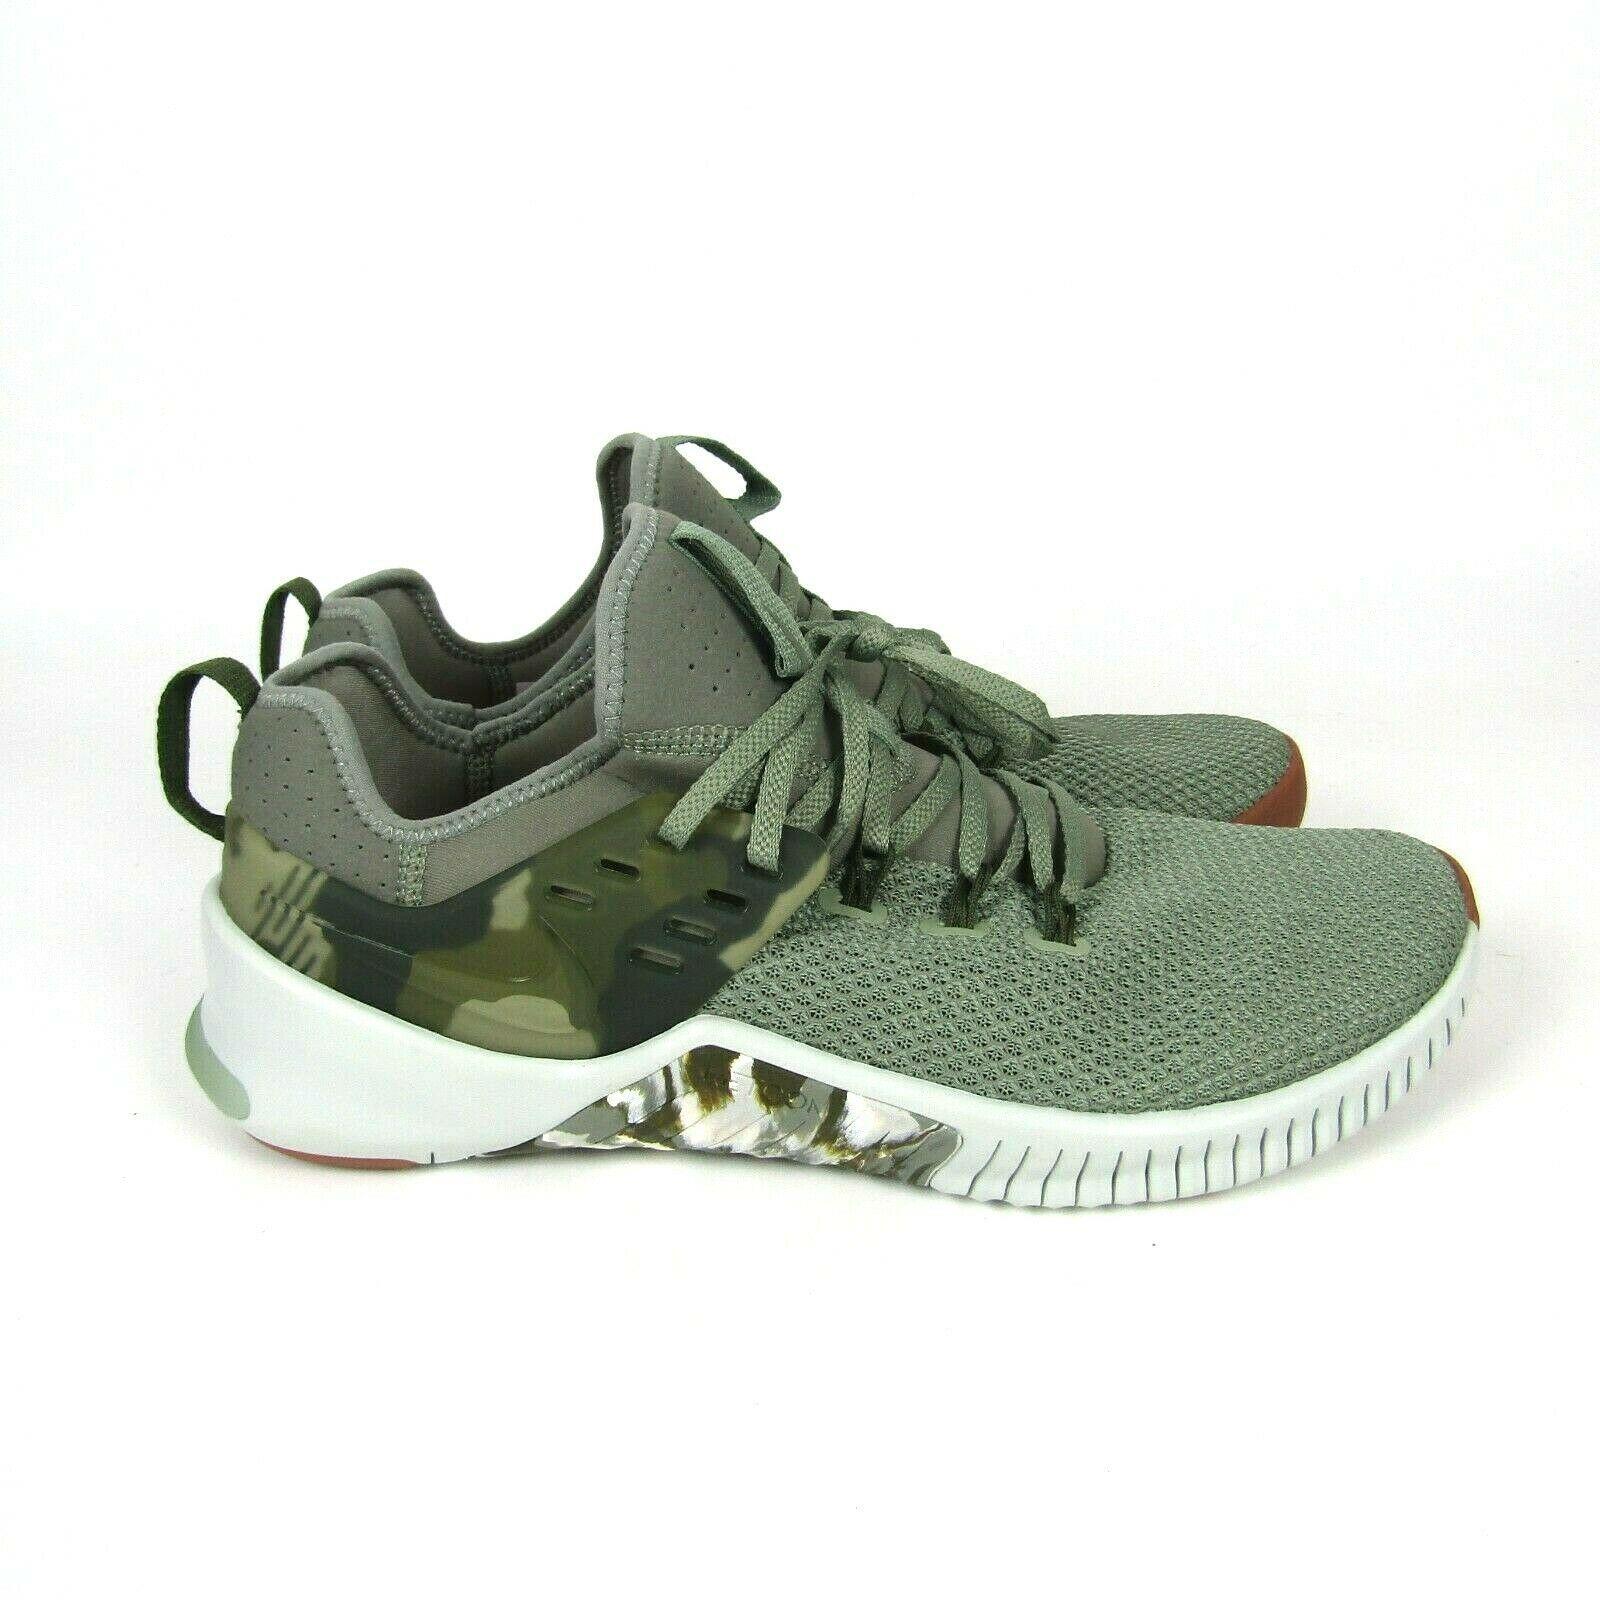 Mens Nike Free Metcon Running Shoes Size 11.5 Green Tan Camo AH8141 002 Trainer